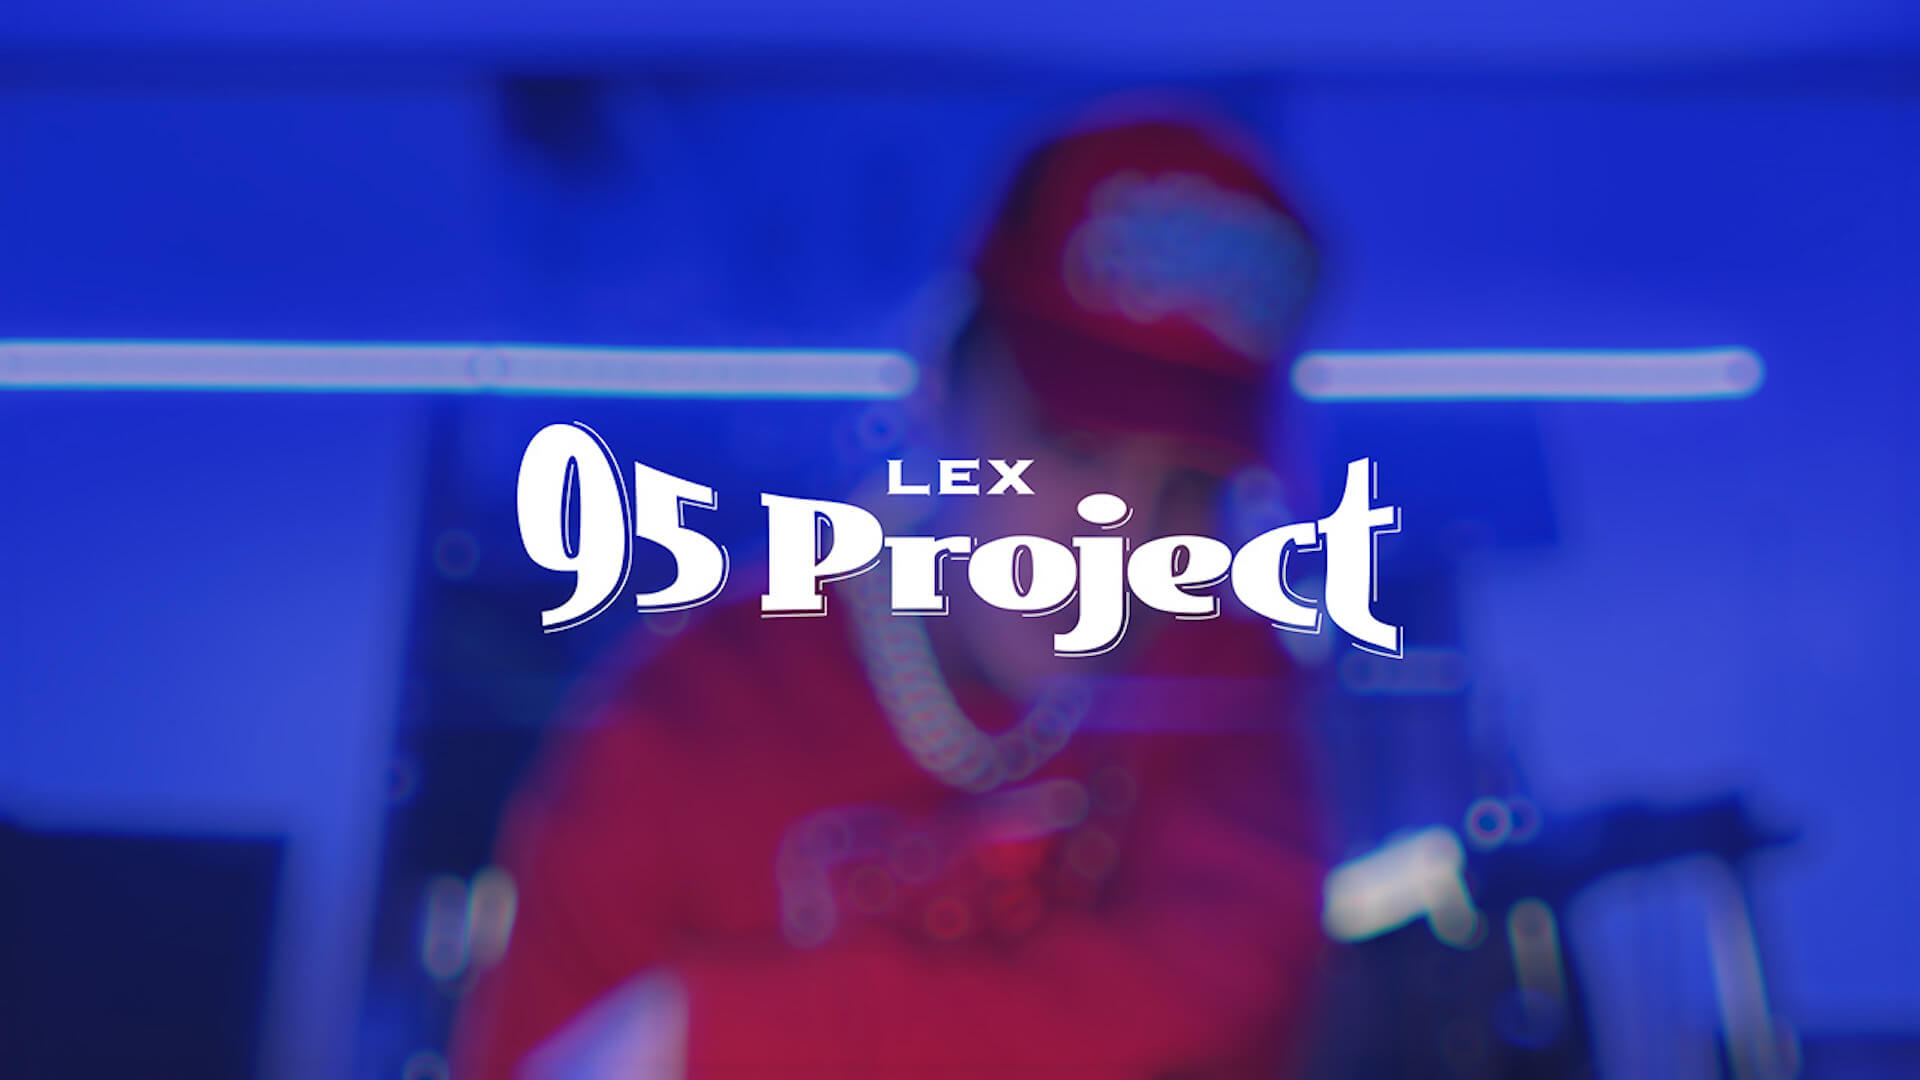 "LEXが最新EP『NEXT』を急遽リリース!<STAR TOUR>のオン・オフショットで構成したMV""95 Project""も公開 music200415_lex_next_03"